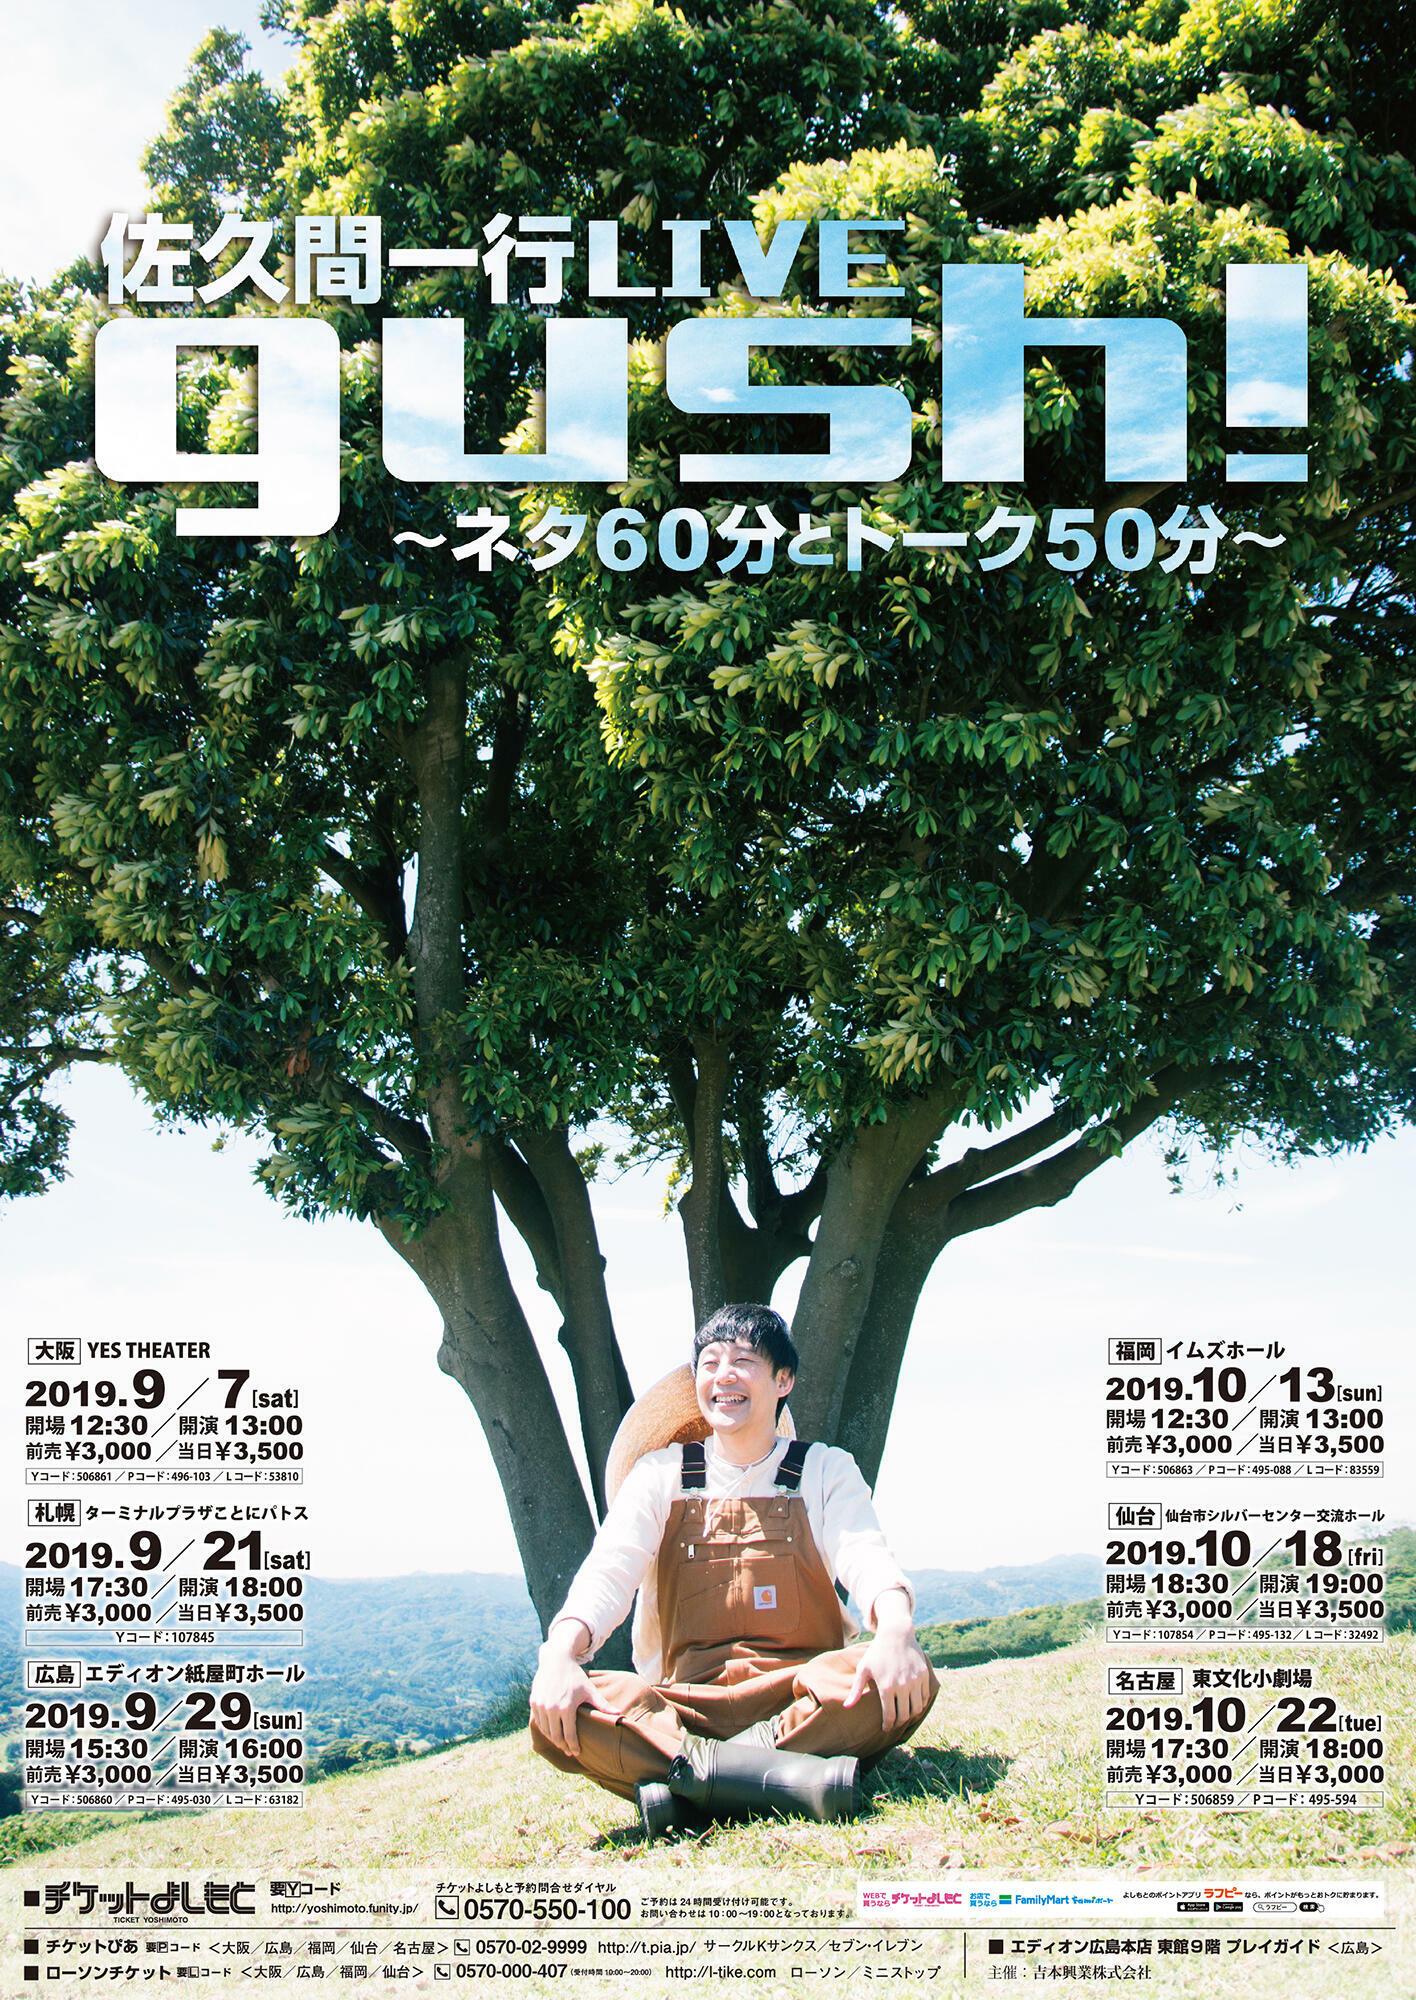 http://www.syumatsu.jp/20190822145727-fb0486898123d51b2bbc6b1f65a0c306361166be.jpg